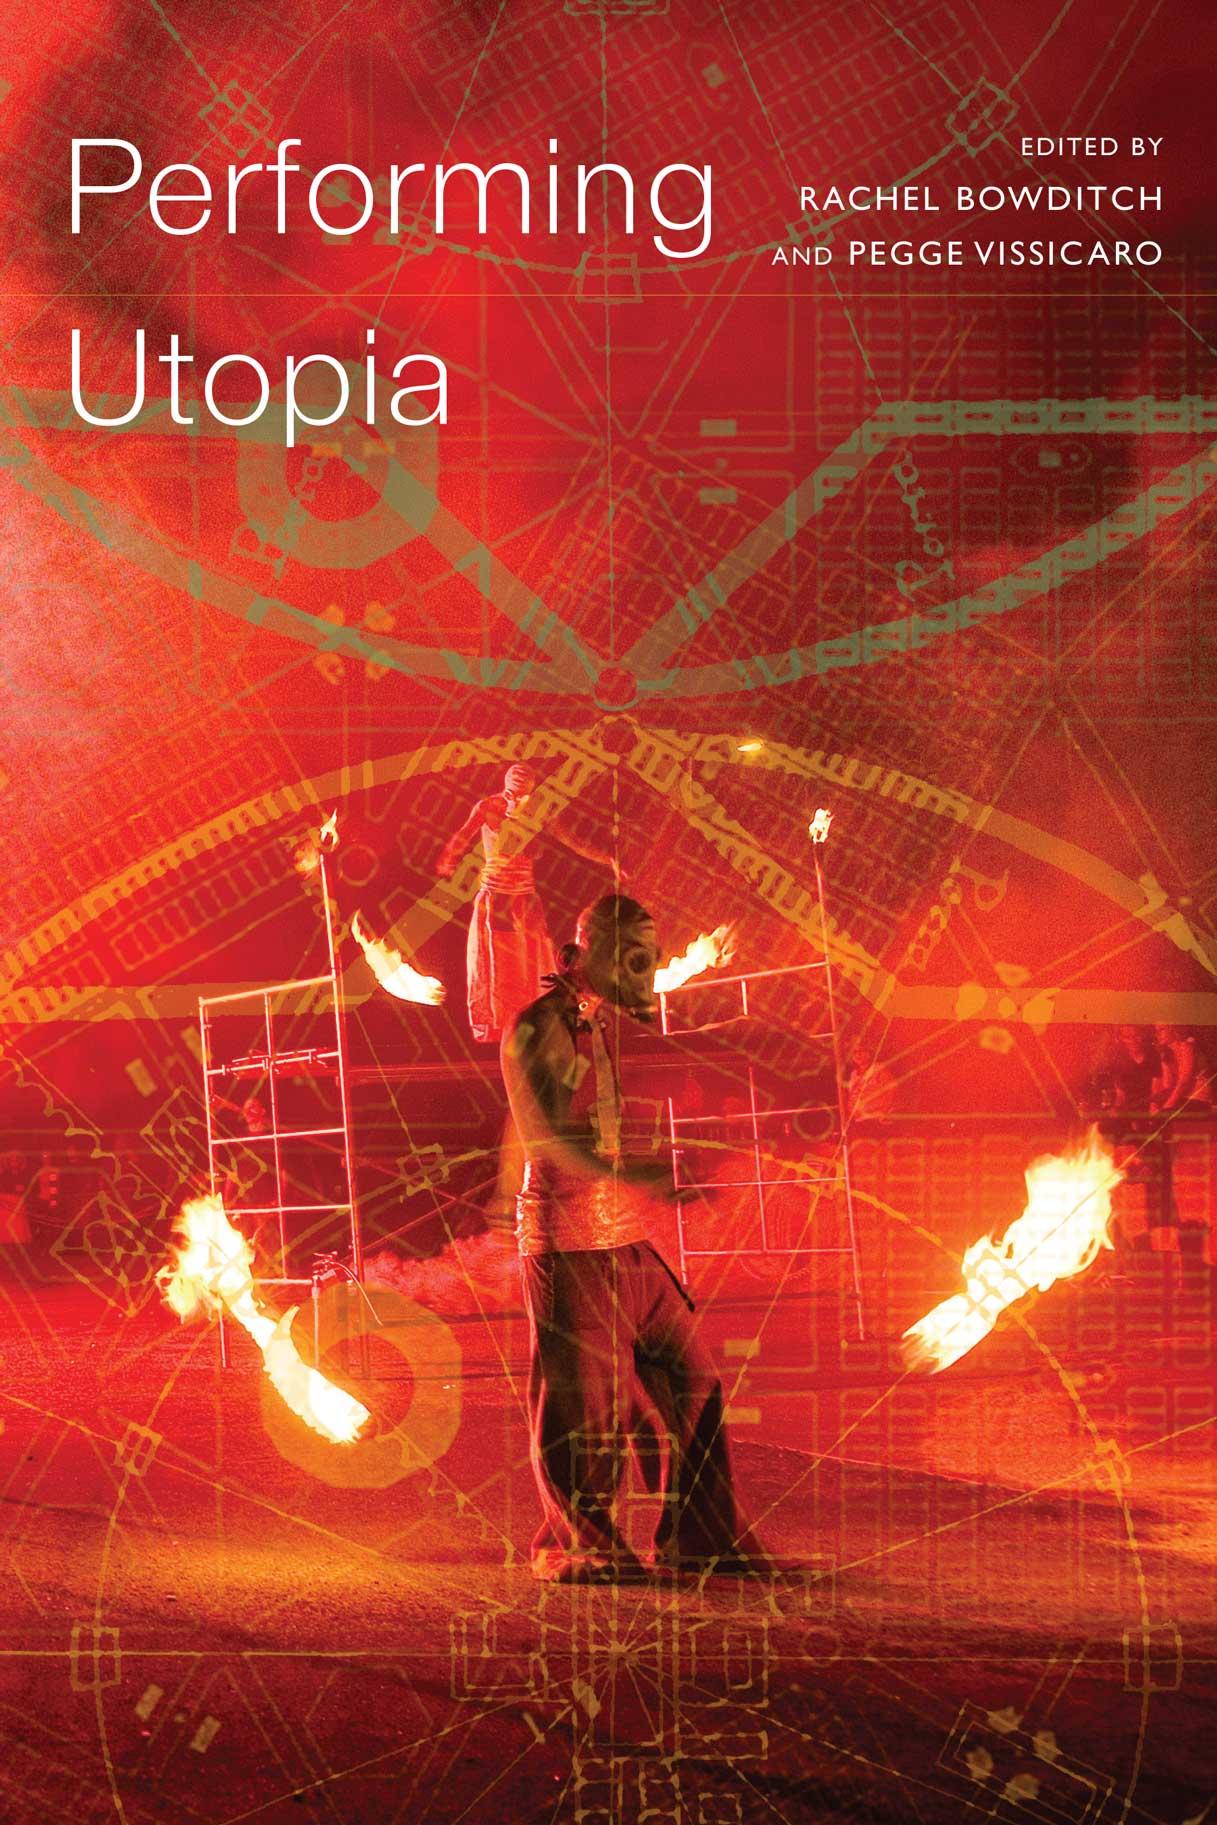 Performing Utopia